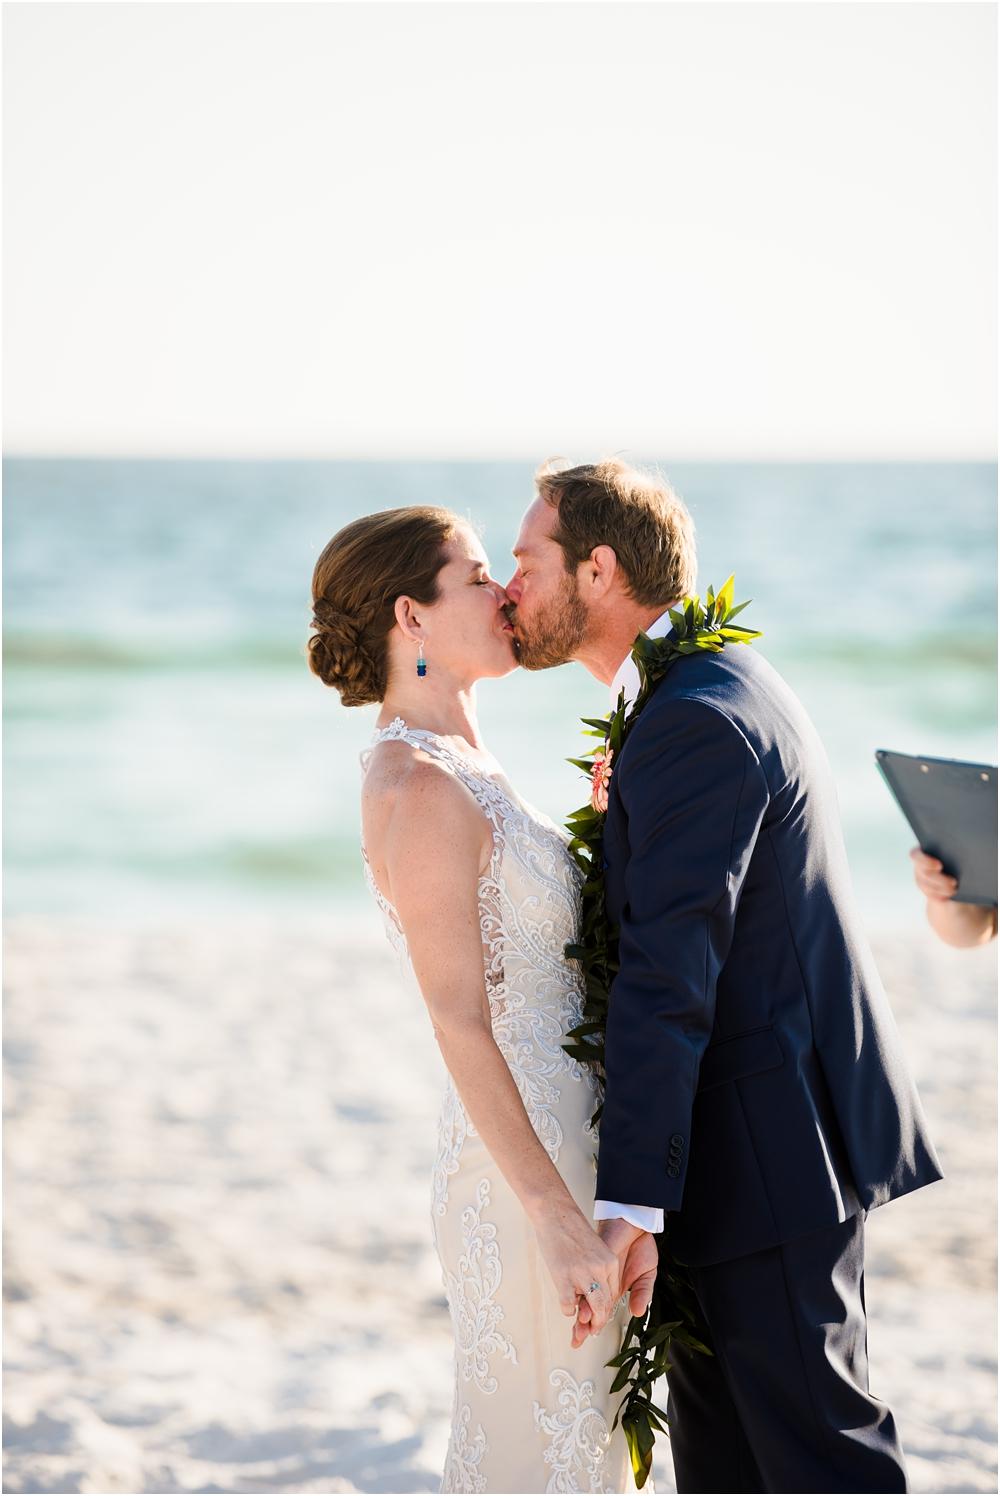 ledman-wedding-kiersten-stevenson-photography-30a-panama-city-beach-dothan-tallahassee-(237-of-763).JPG